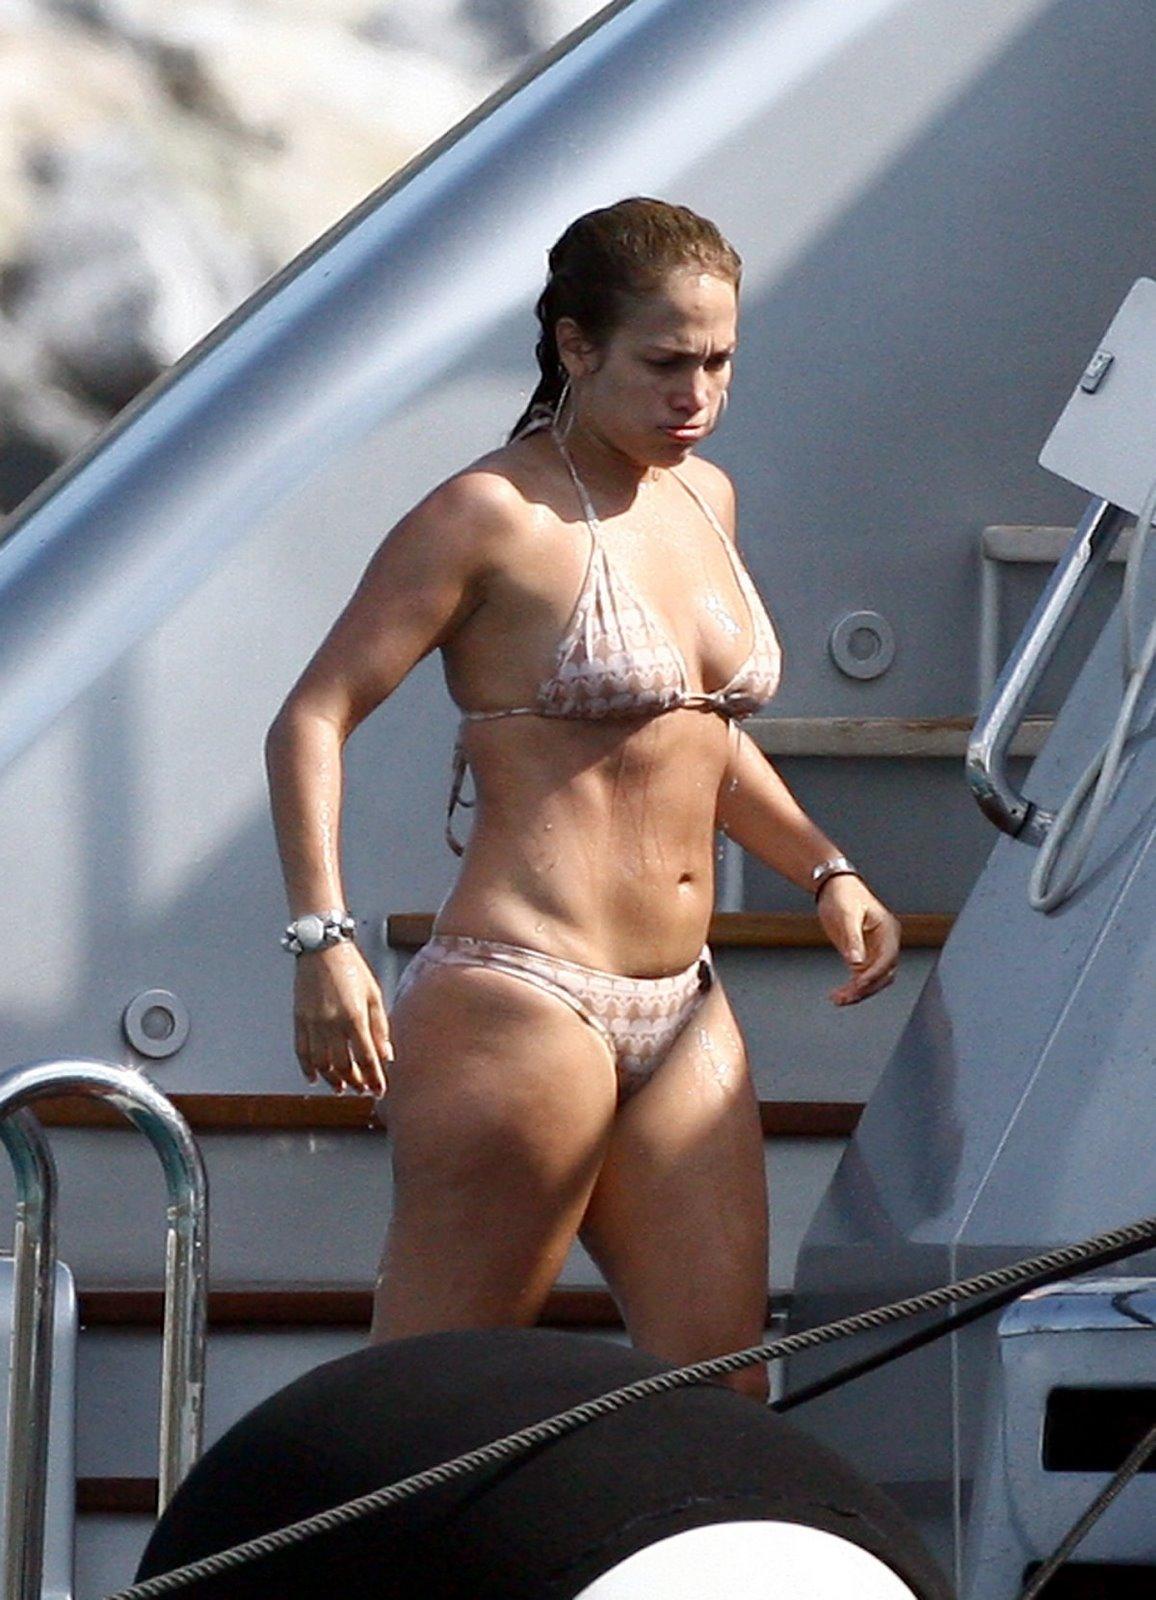 http://3.bp.blogspot.com/-mOKGxyajOP8/TpcMa57QksI/AAAAAAAABdg/-5ORwNjuXuc/s1600/Jennifer+Lopez+Bikini+%252810%2529.jpg